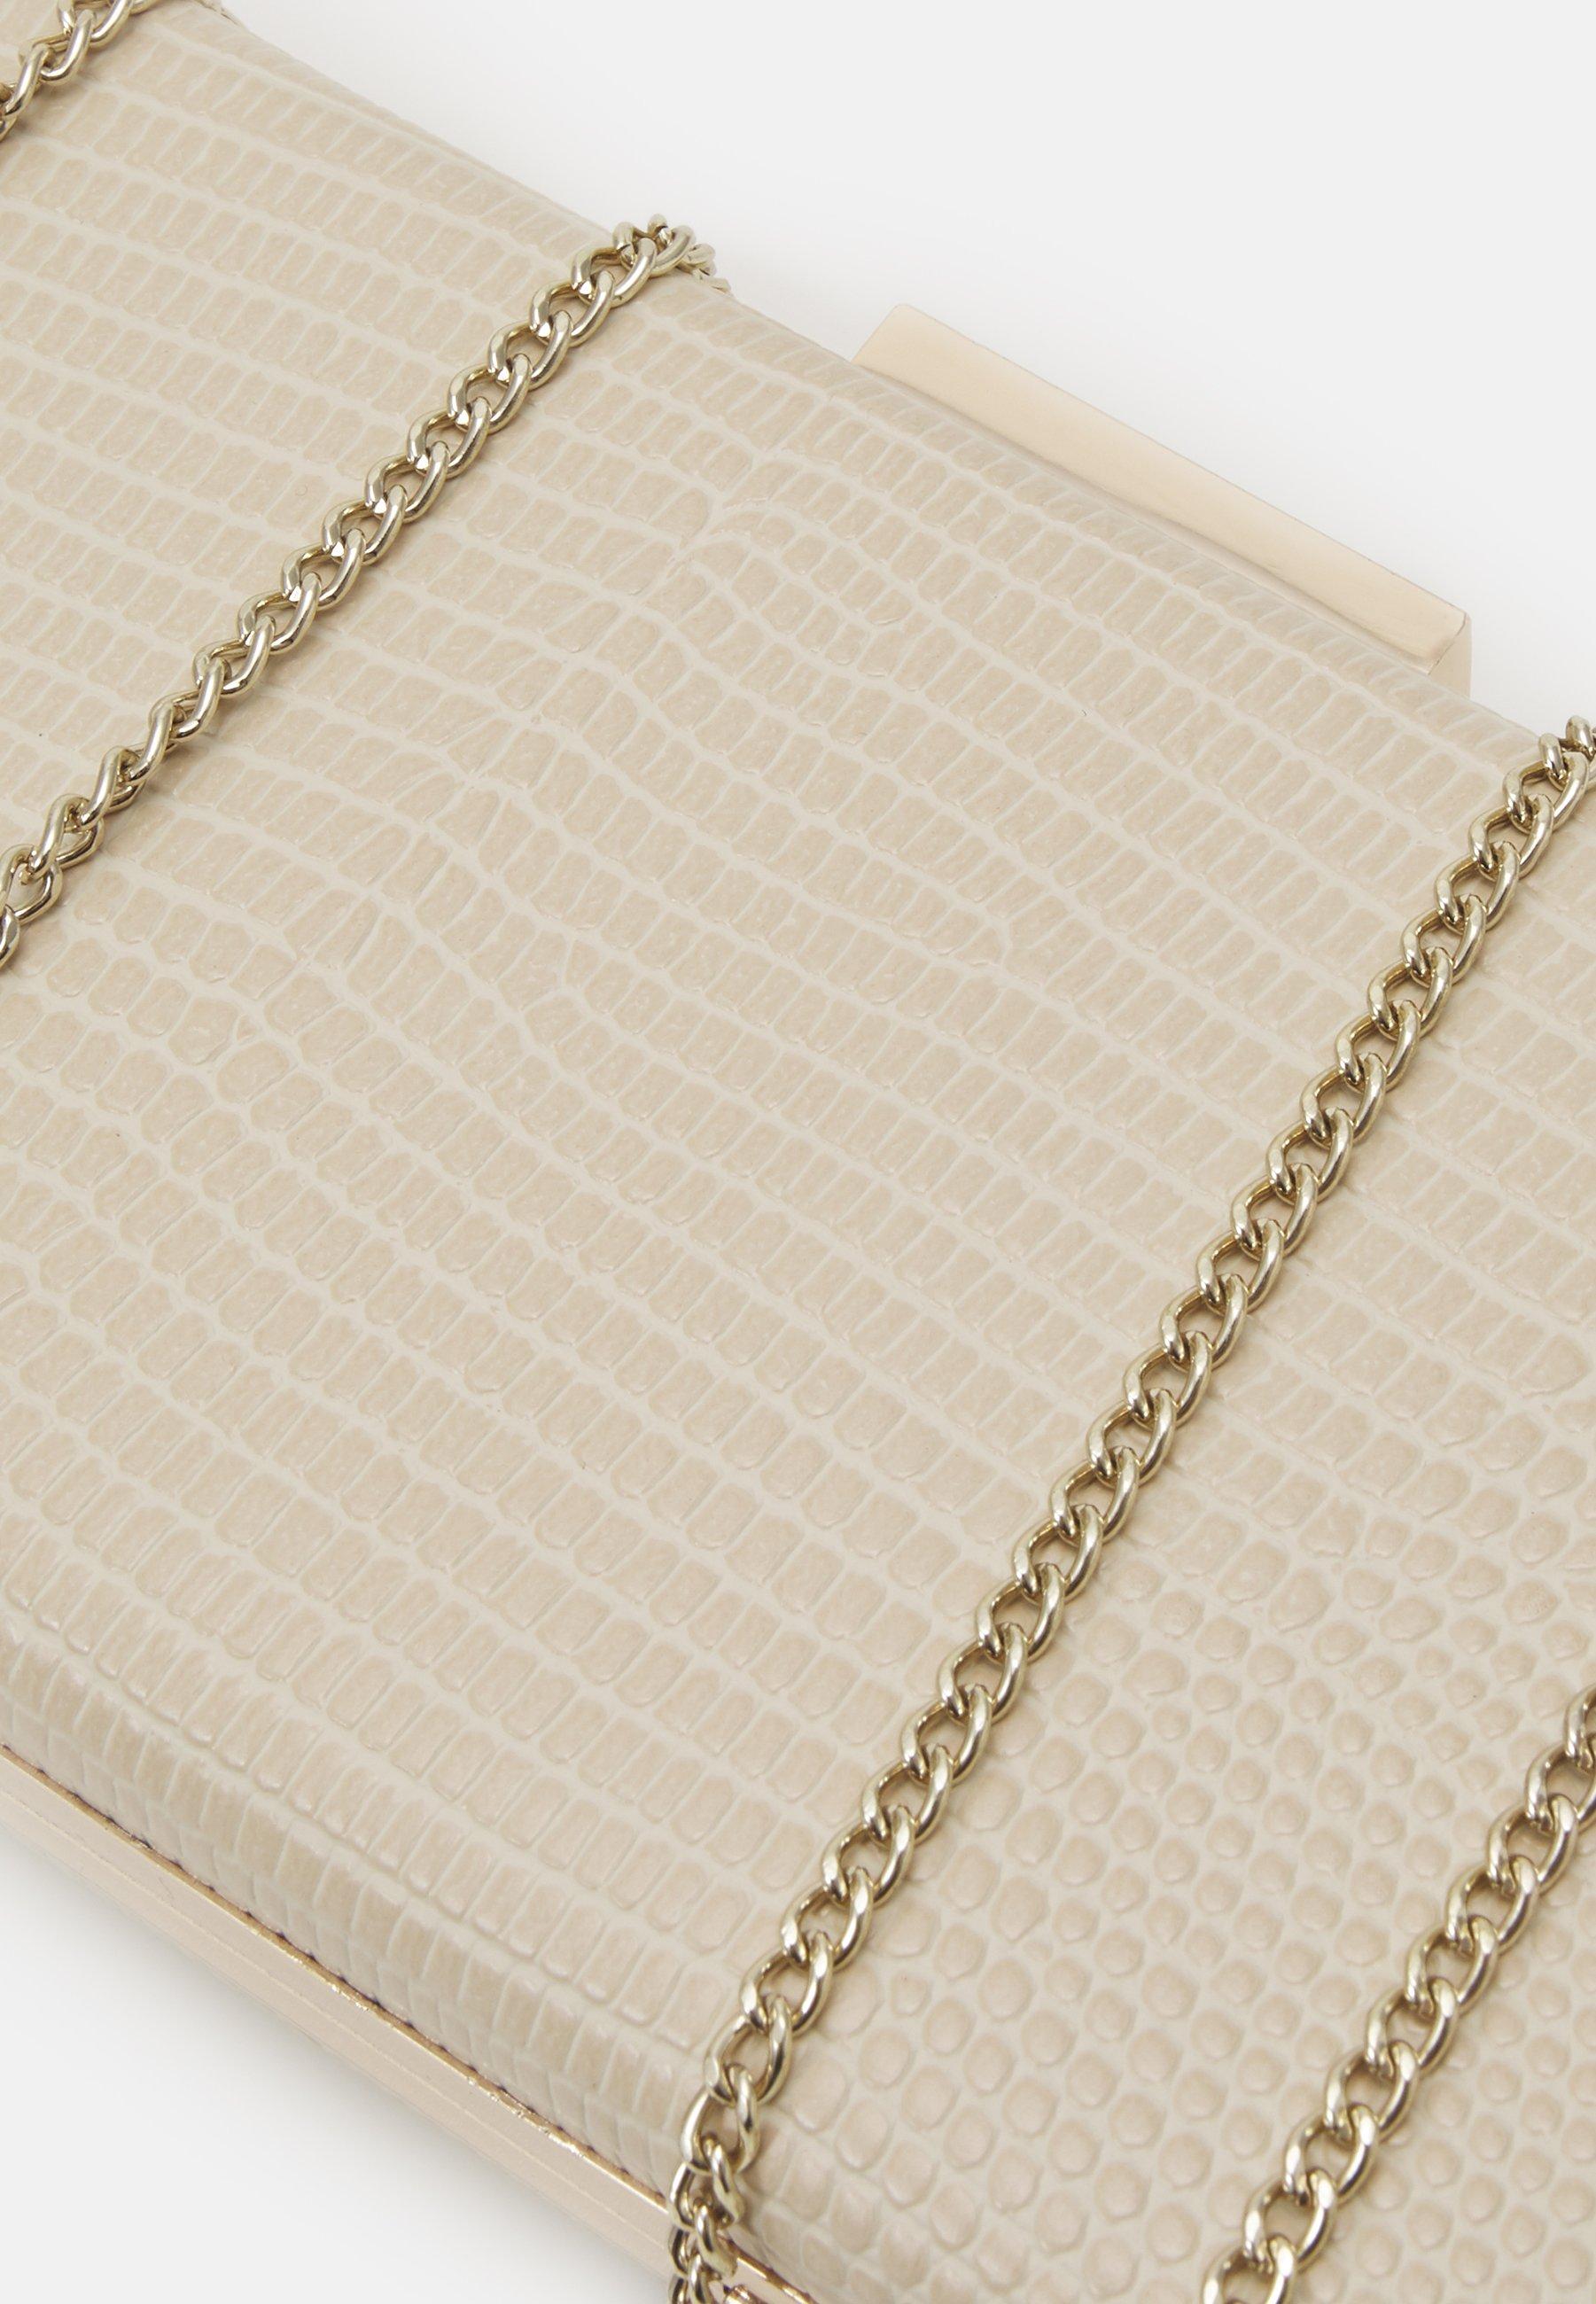 PARFOIS BOX BAG - Clutch - beige uZuK9i0HTeqHTfp